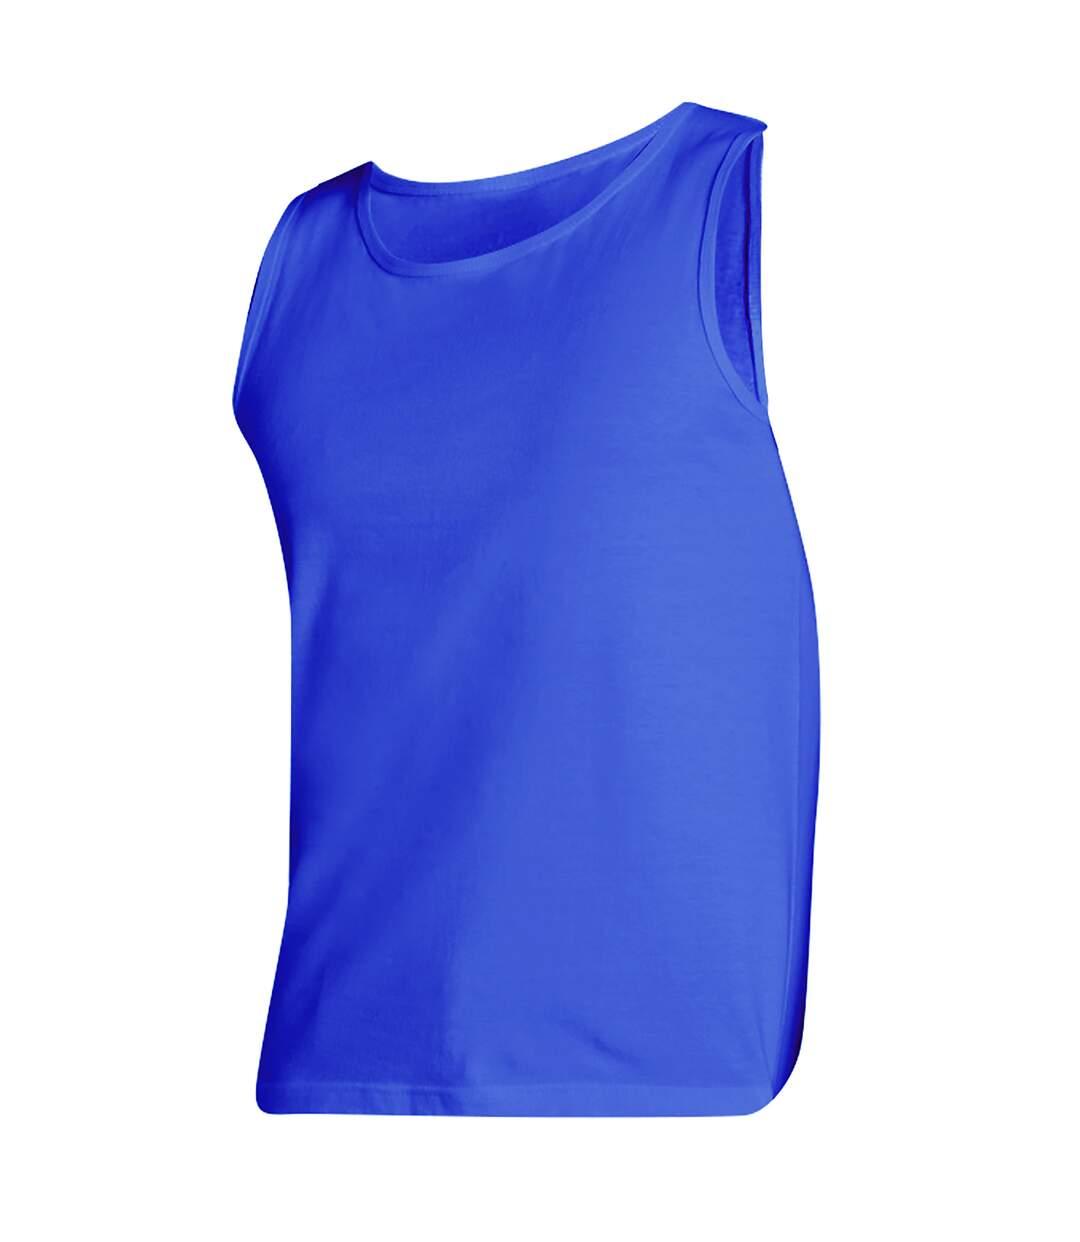 SOLS Mens Justin Sleeveless Tank / Vest Top (Blue Atoll) - UTPC312